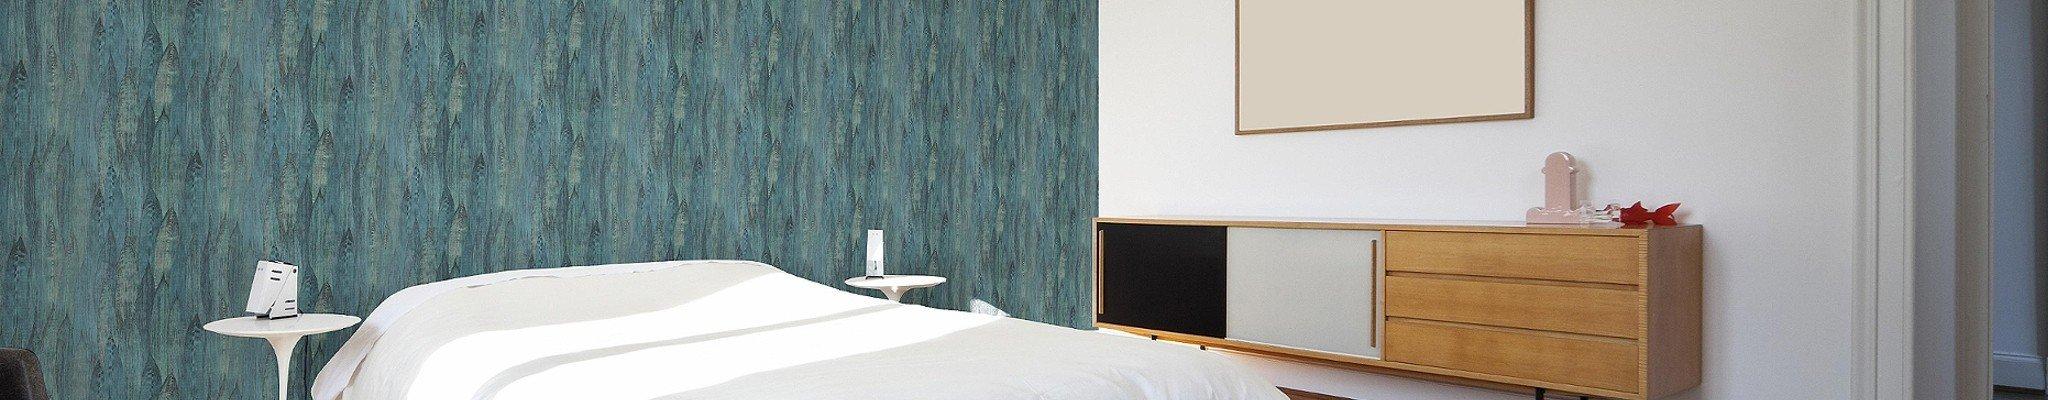 neue tapeten petrol tapeten lust auf was neues. Black Bedroom Furniture Sets. Home Design Ideas